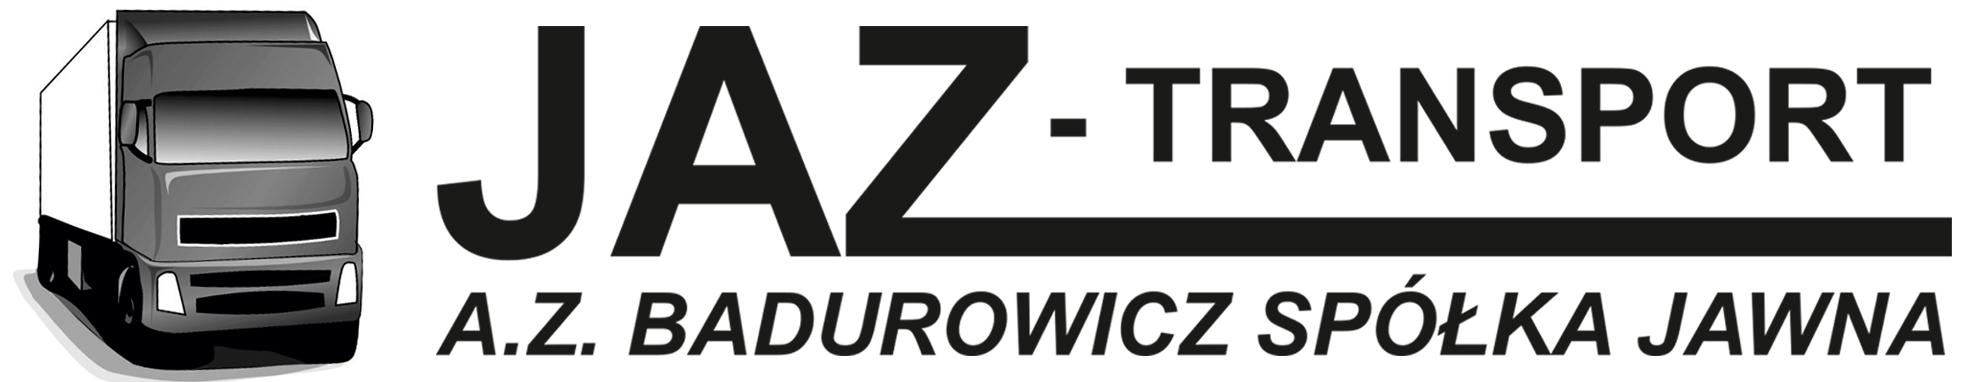 Jaz-Transport